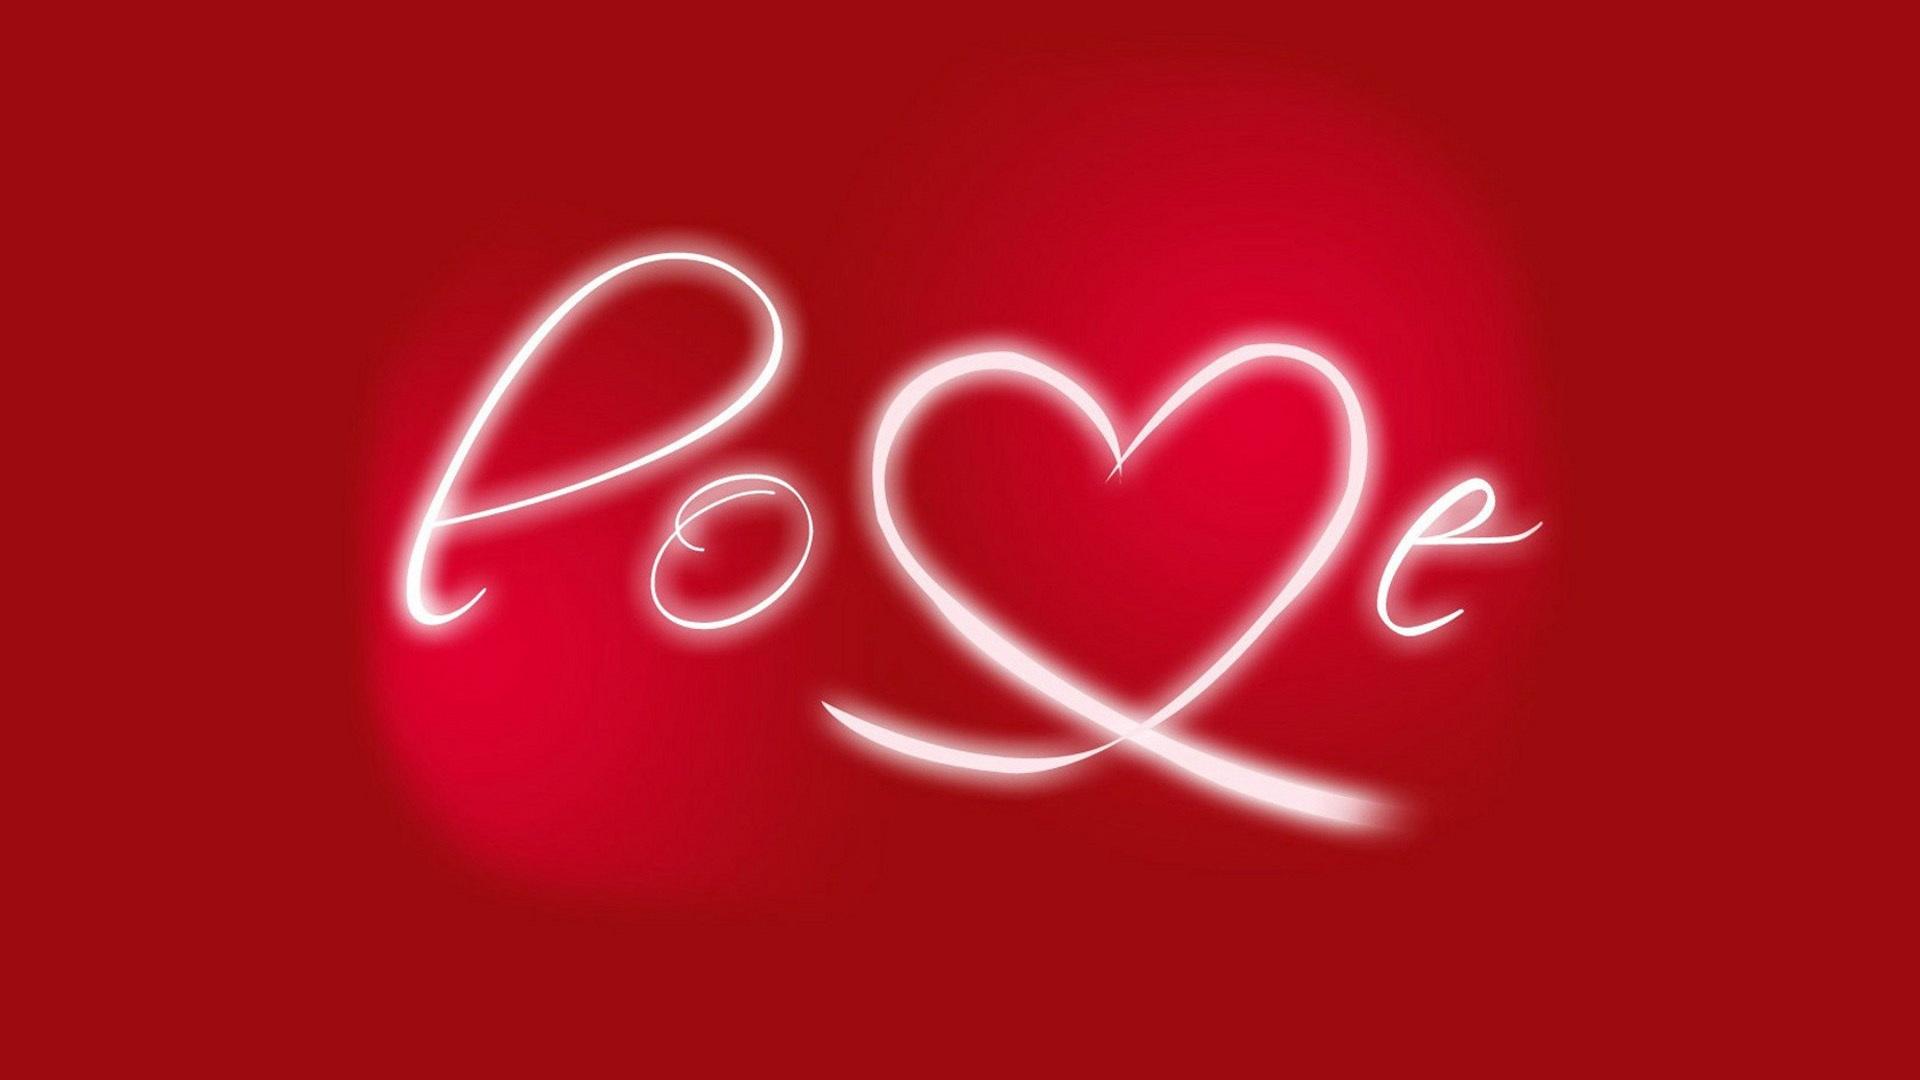 description free download valentine - photo #26